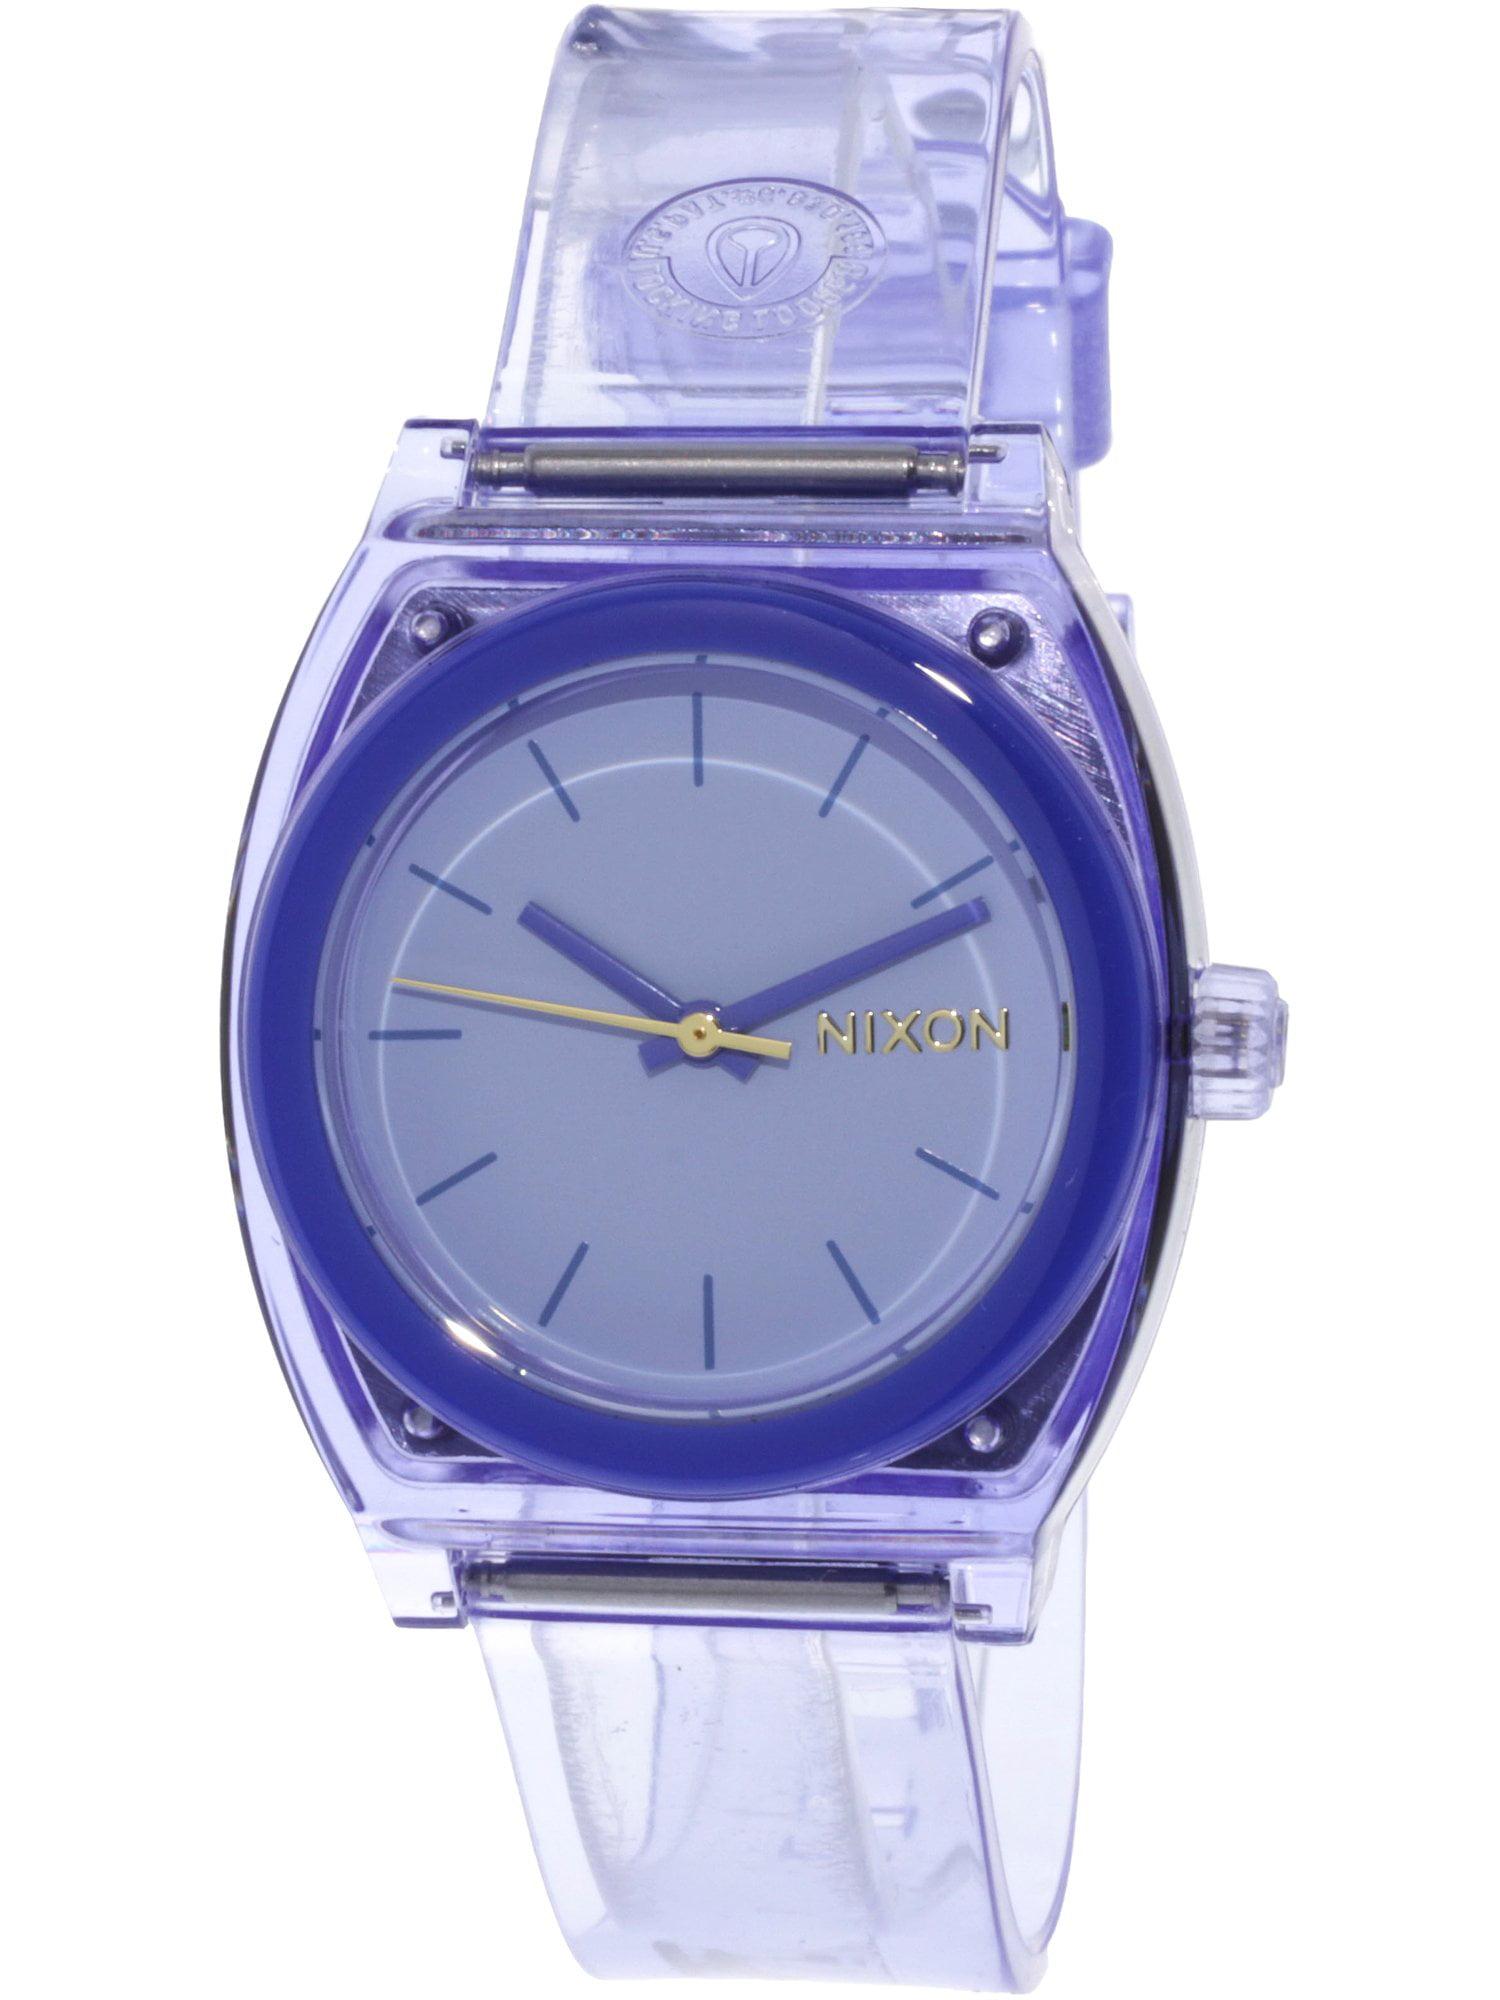 Time Teller A12152885 Blue Rubber Japanese Quartz Fashion Watch